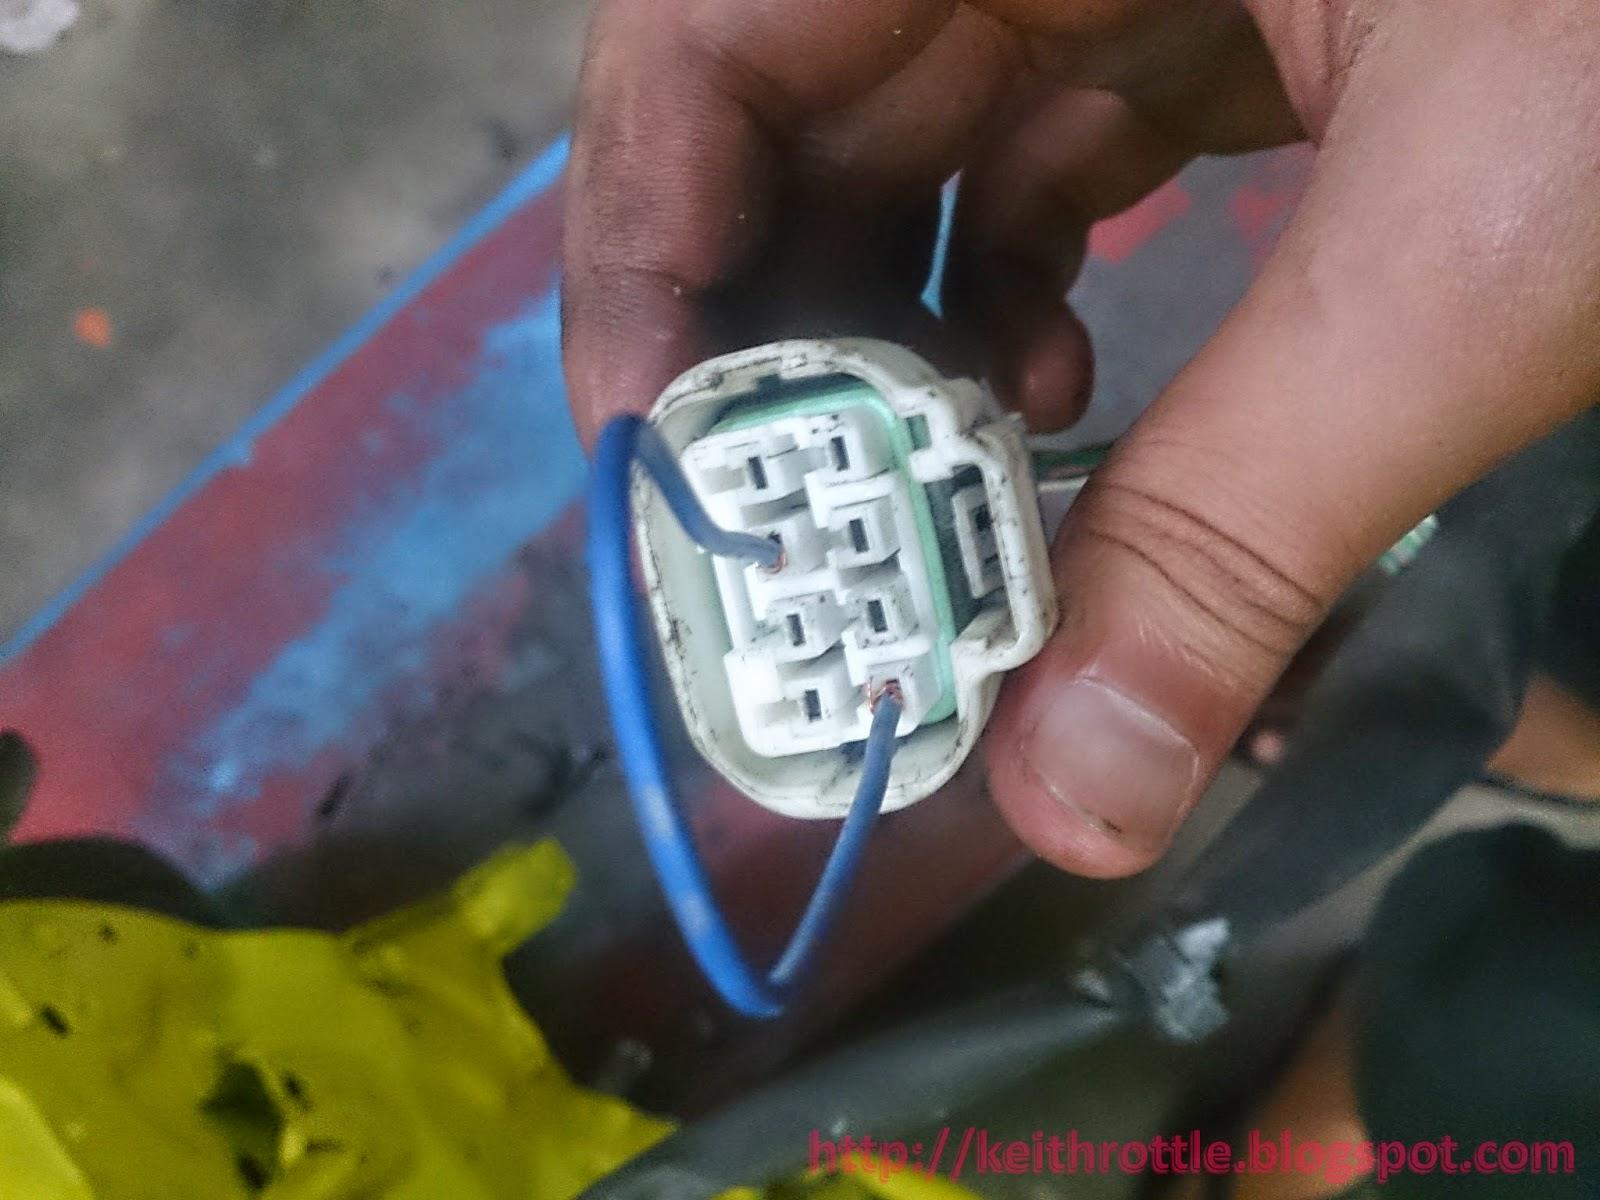 Wiring Diagram Jb Det 21 Images Diagrams Daihatsu Terios Ecu 2015 04 242b020113 Perodua Kancil With L902 Engine Update